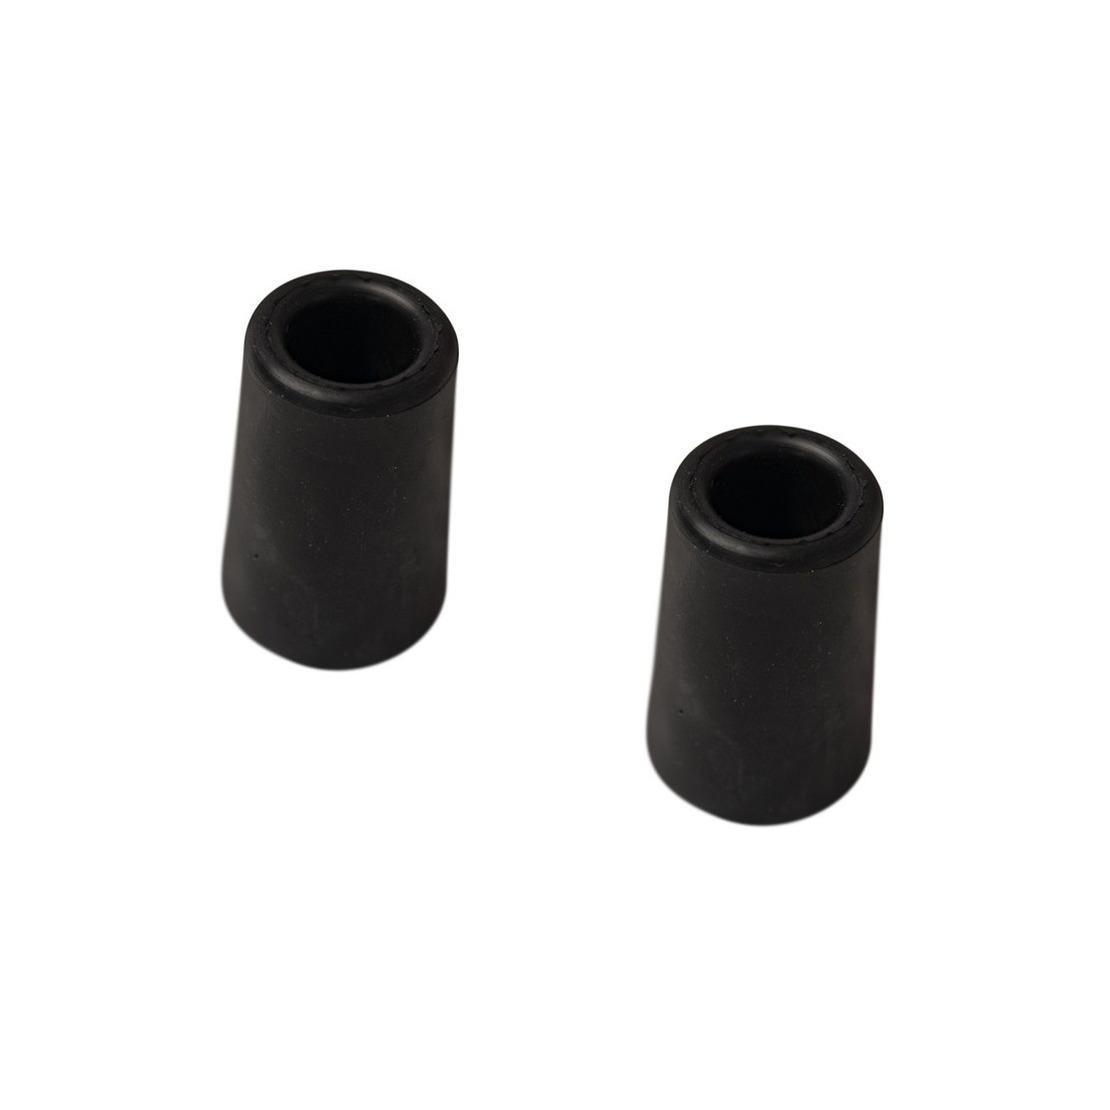 3x stuks deurstopper - deurbuffer rubber zwart 60 mm